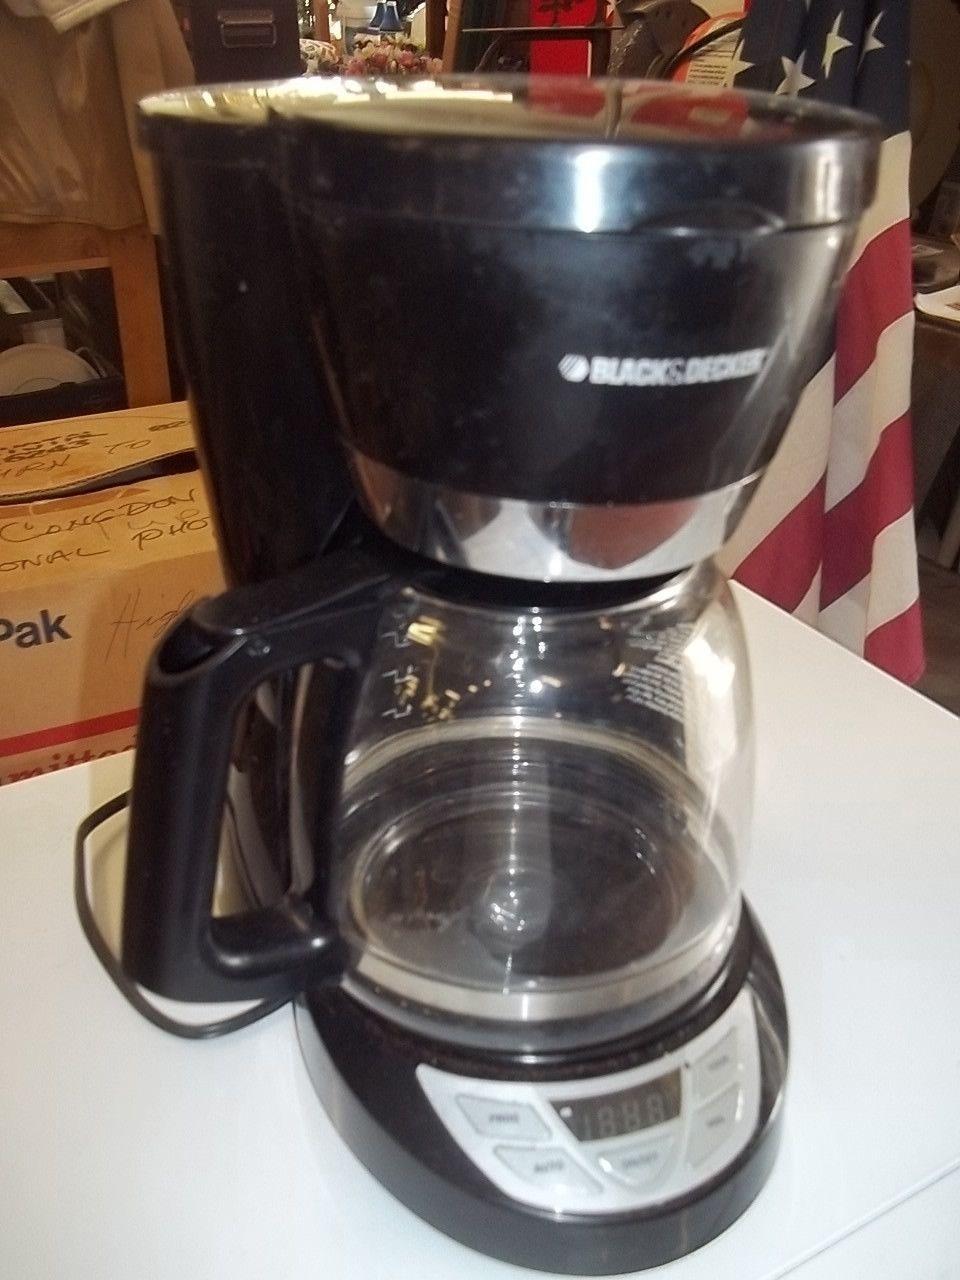 Coffee maker black and decker 8347 coffee maker coffee